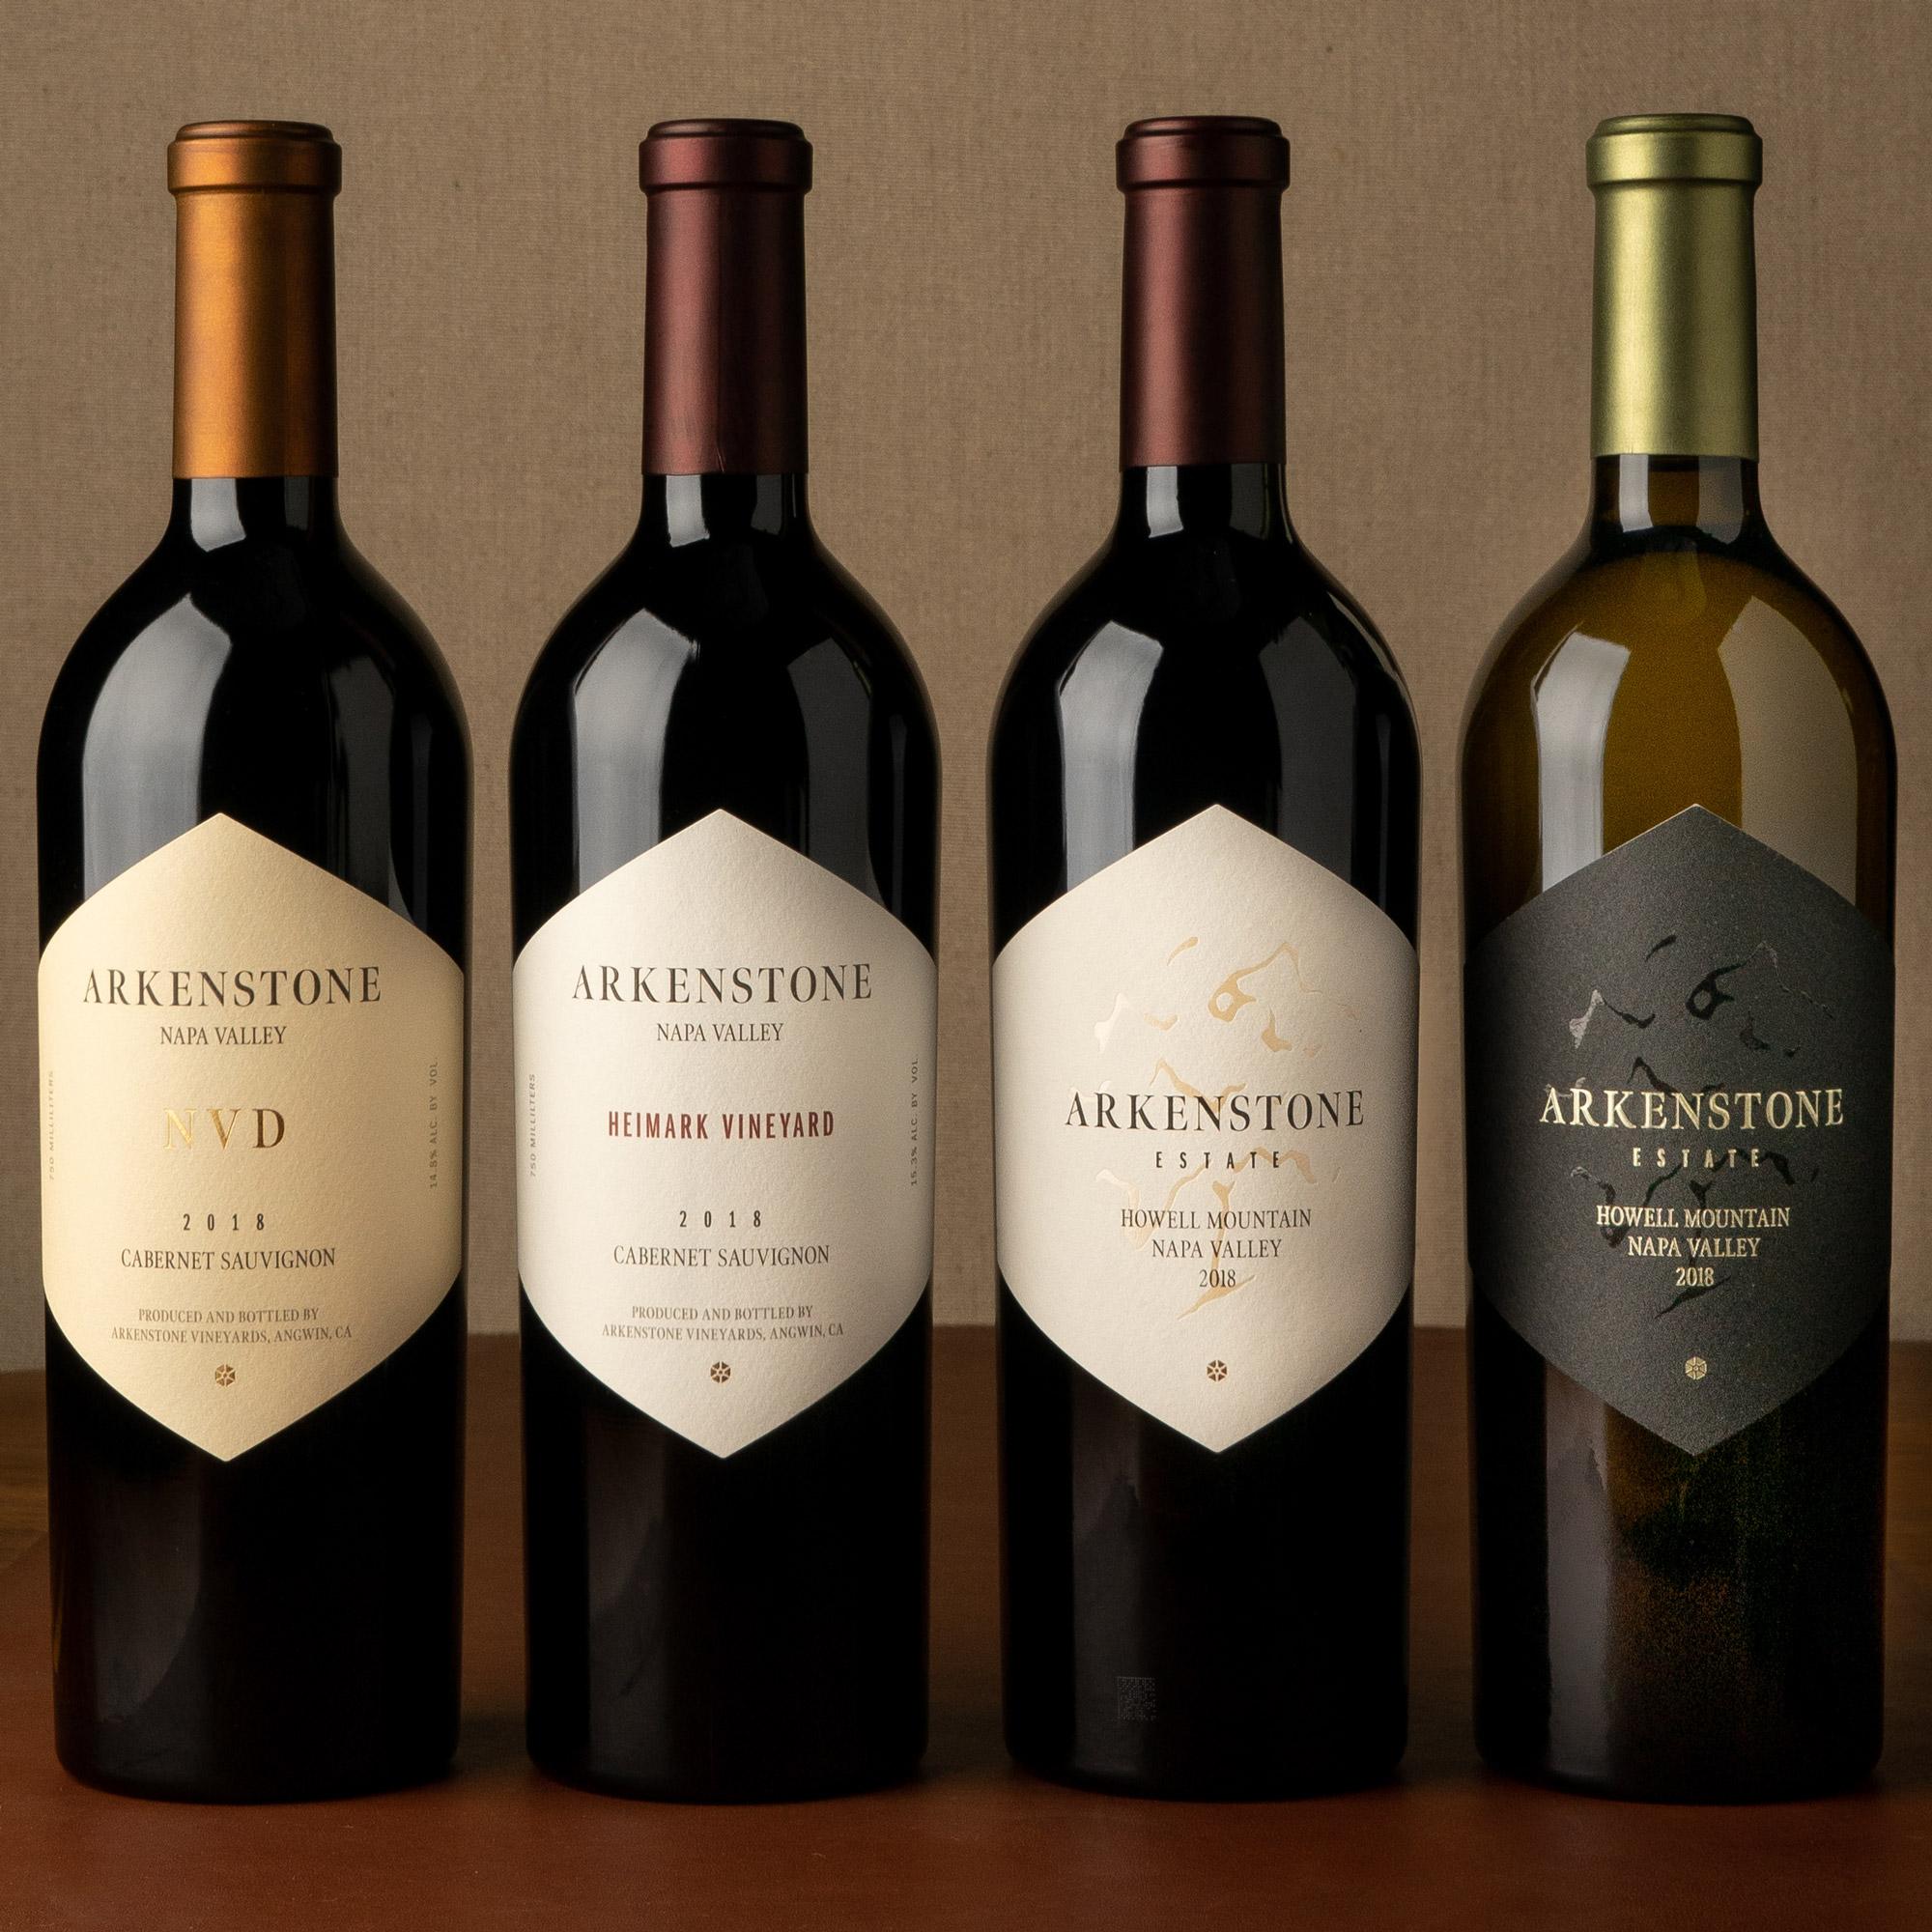 Arkenstone packaging portfolio of wines